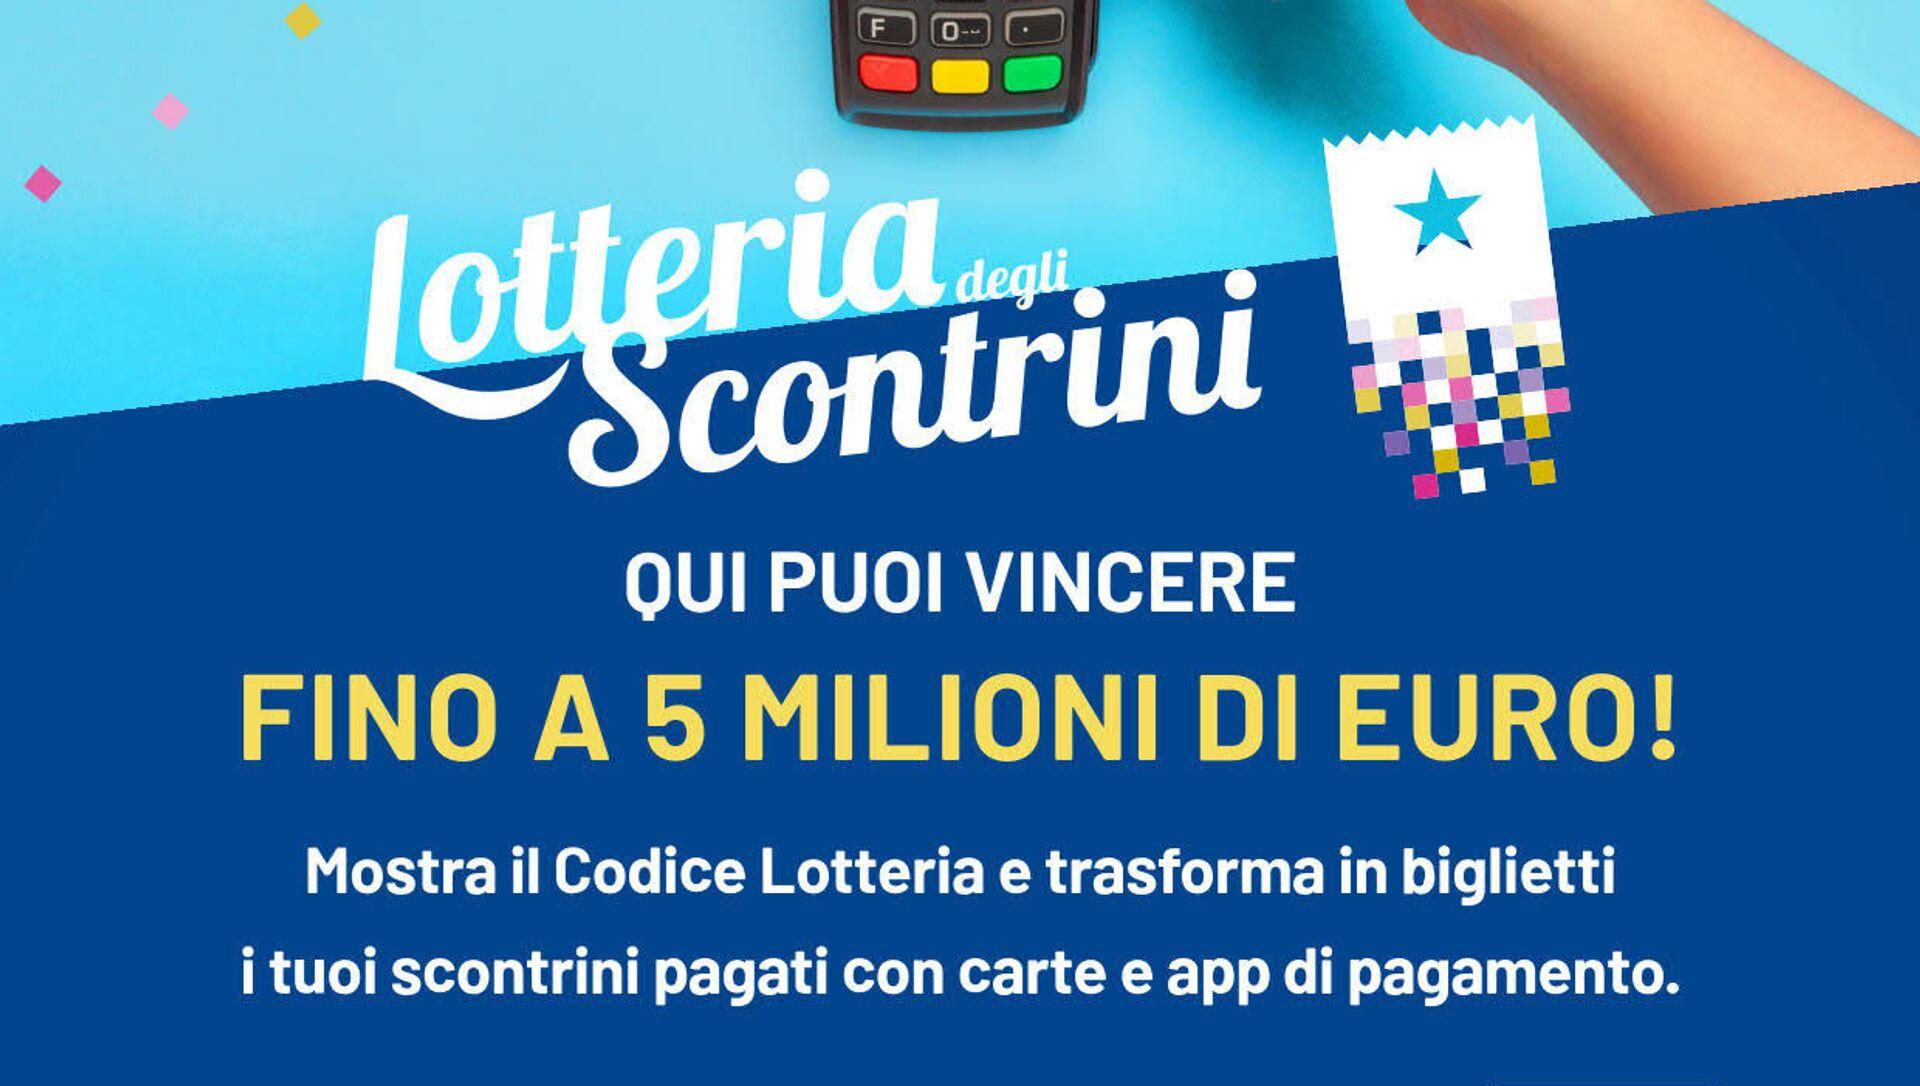 Lotteria degli scontrini - Sputnik Italia, 1920, 08.04.2021